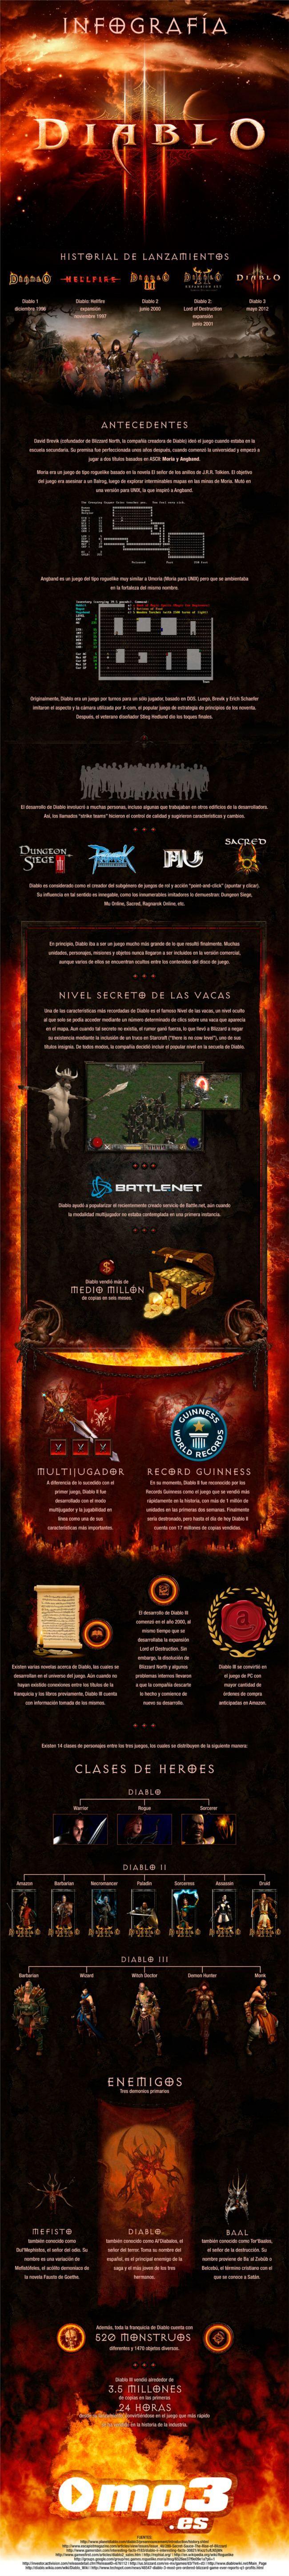 Juego Diablo III #infografia #infographic